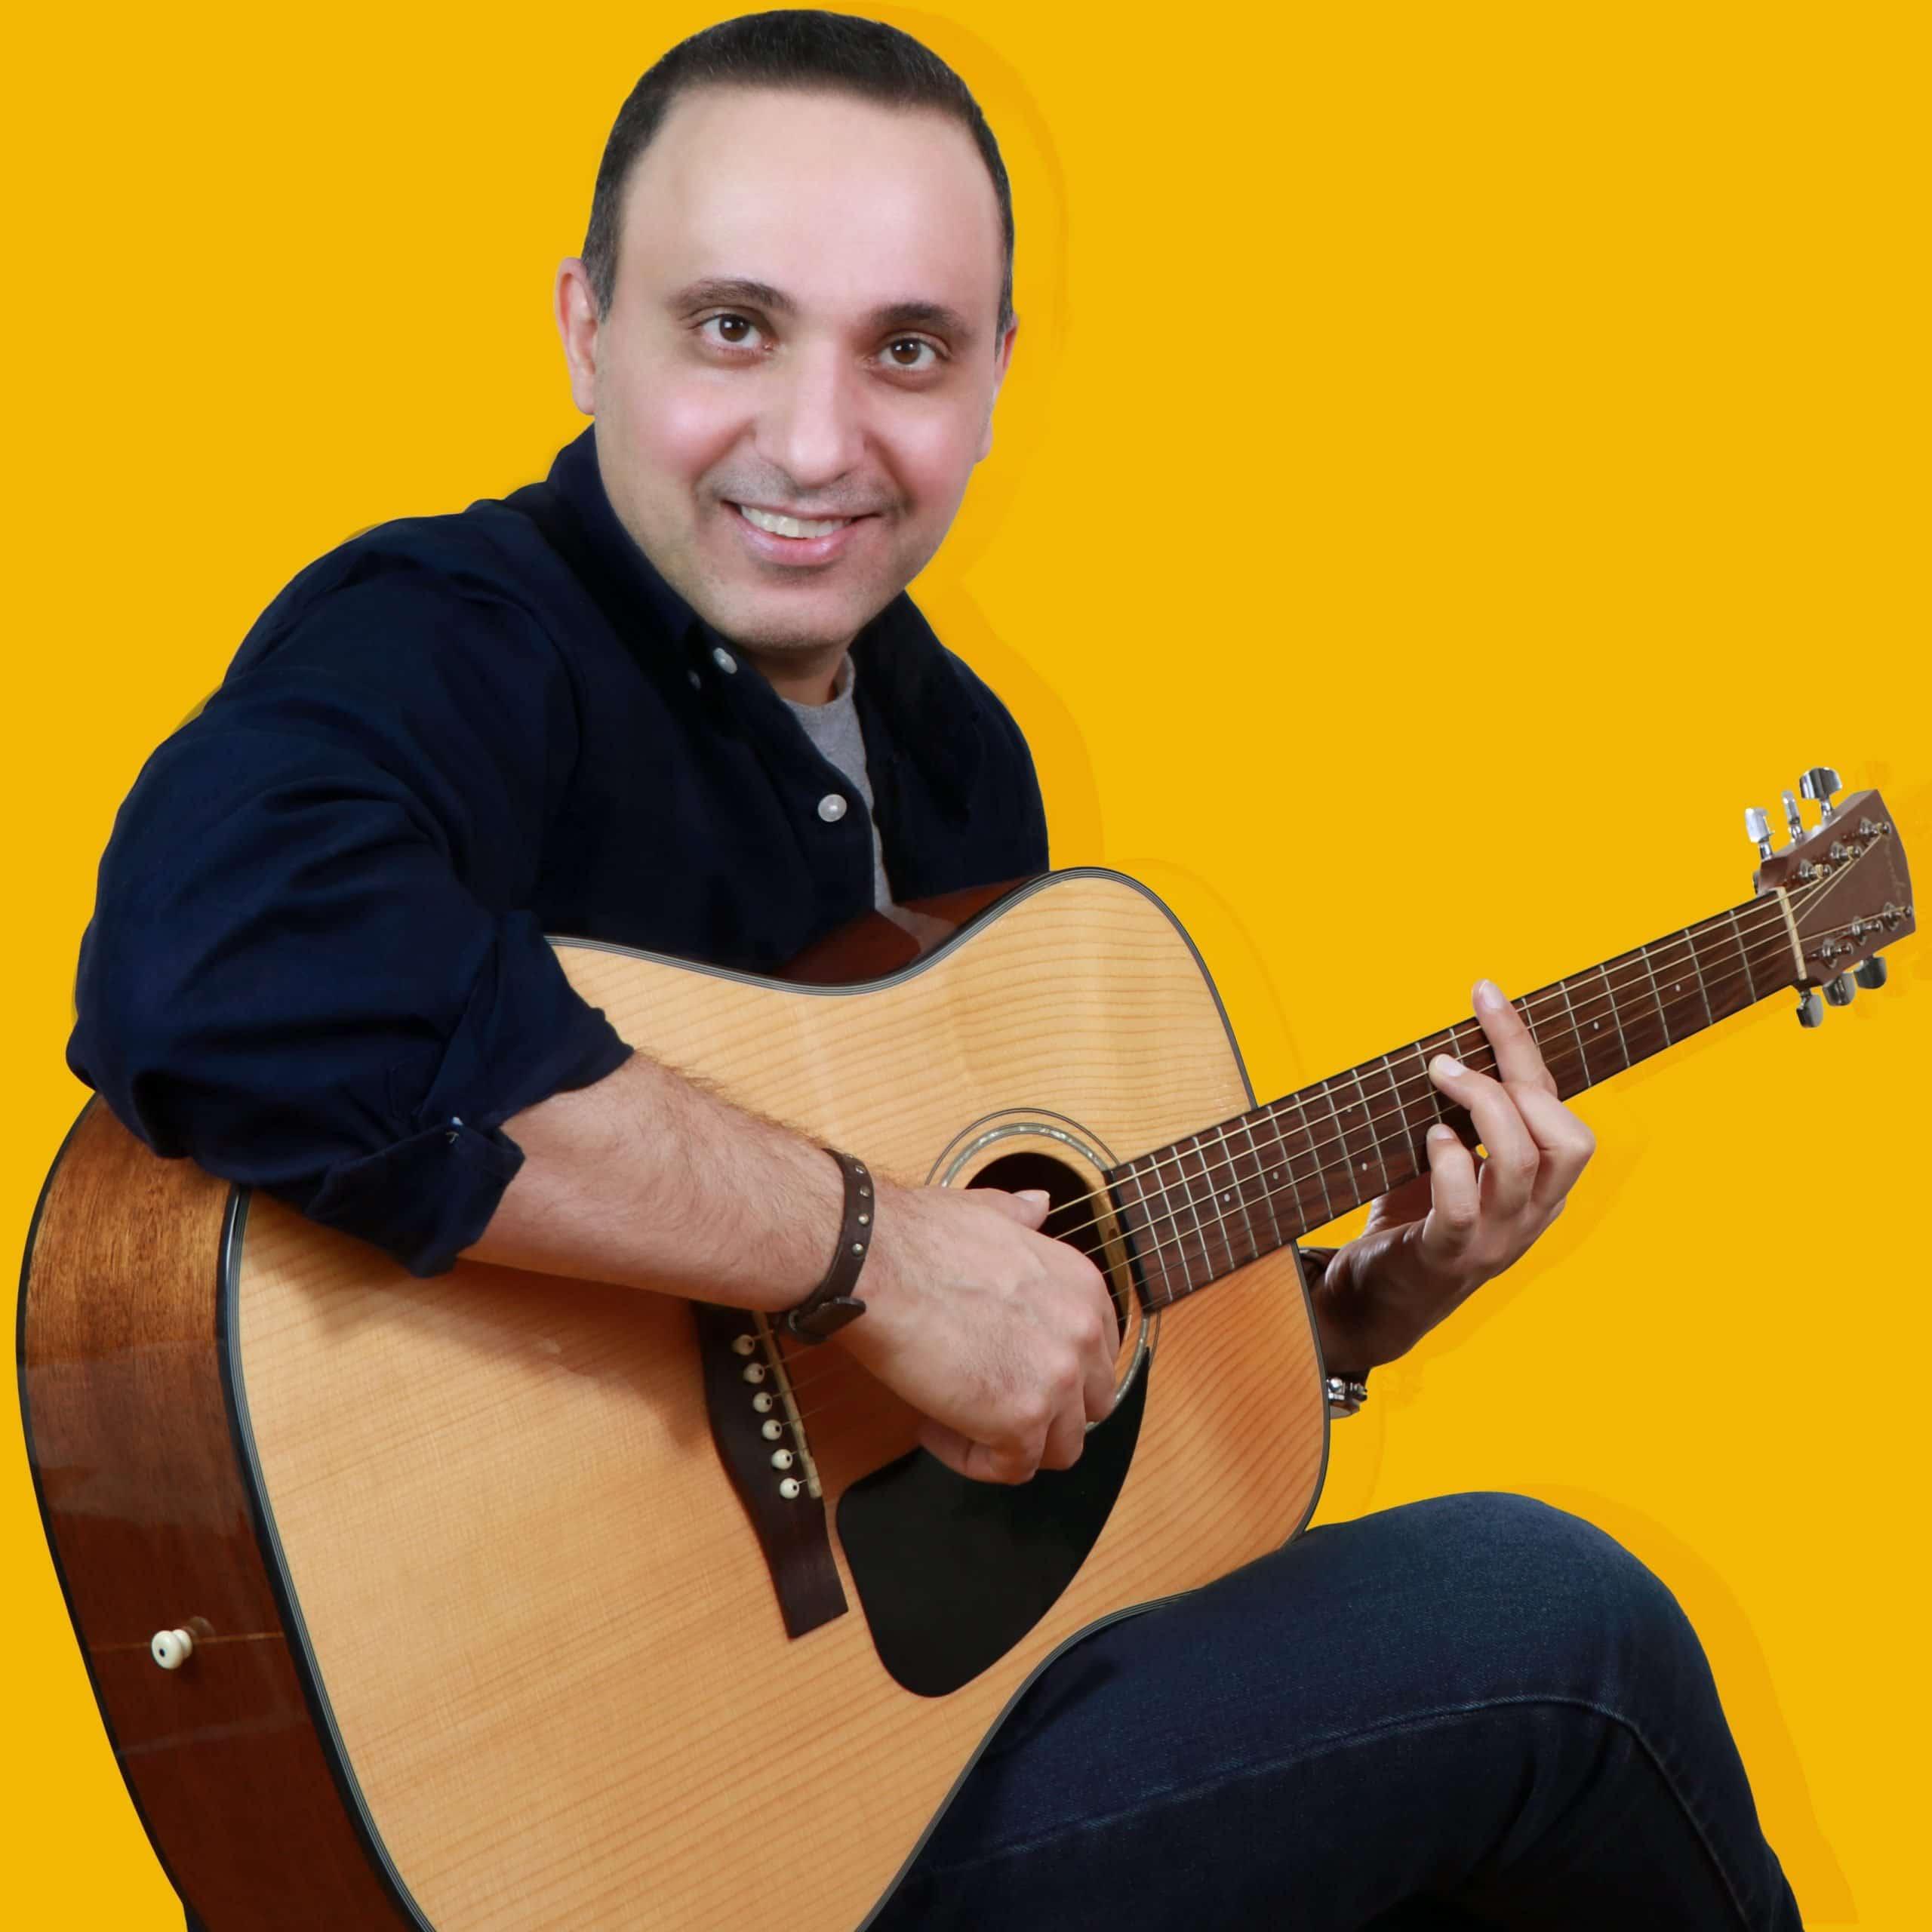 Iman Guitar Profile Picture scaled